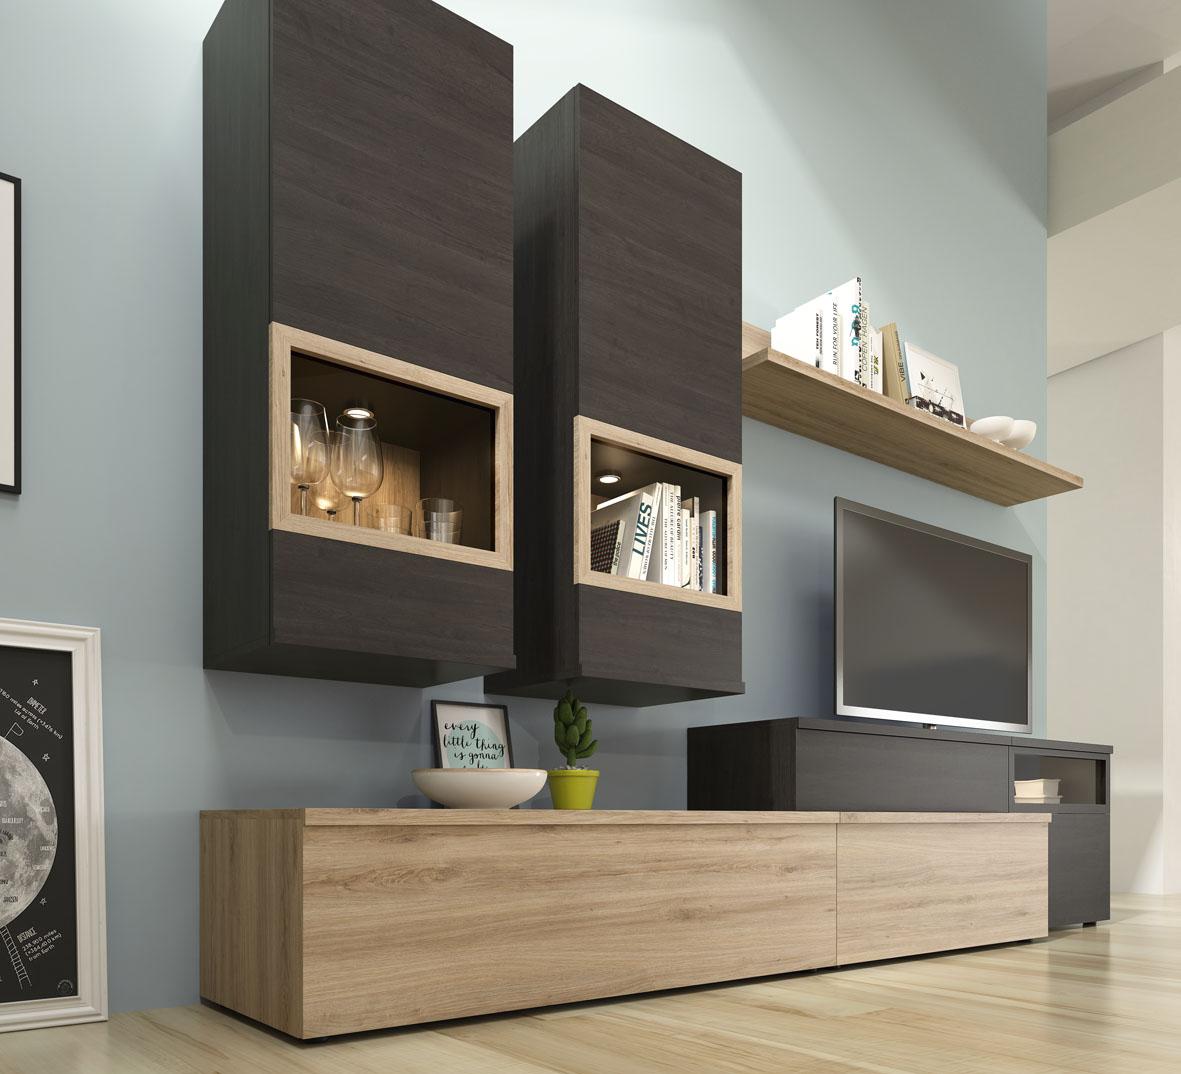 salon-moderno-Neo-2.0-muebles-paco-caballero-907-5d10b3076b850